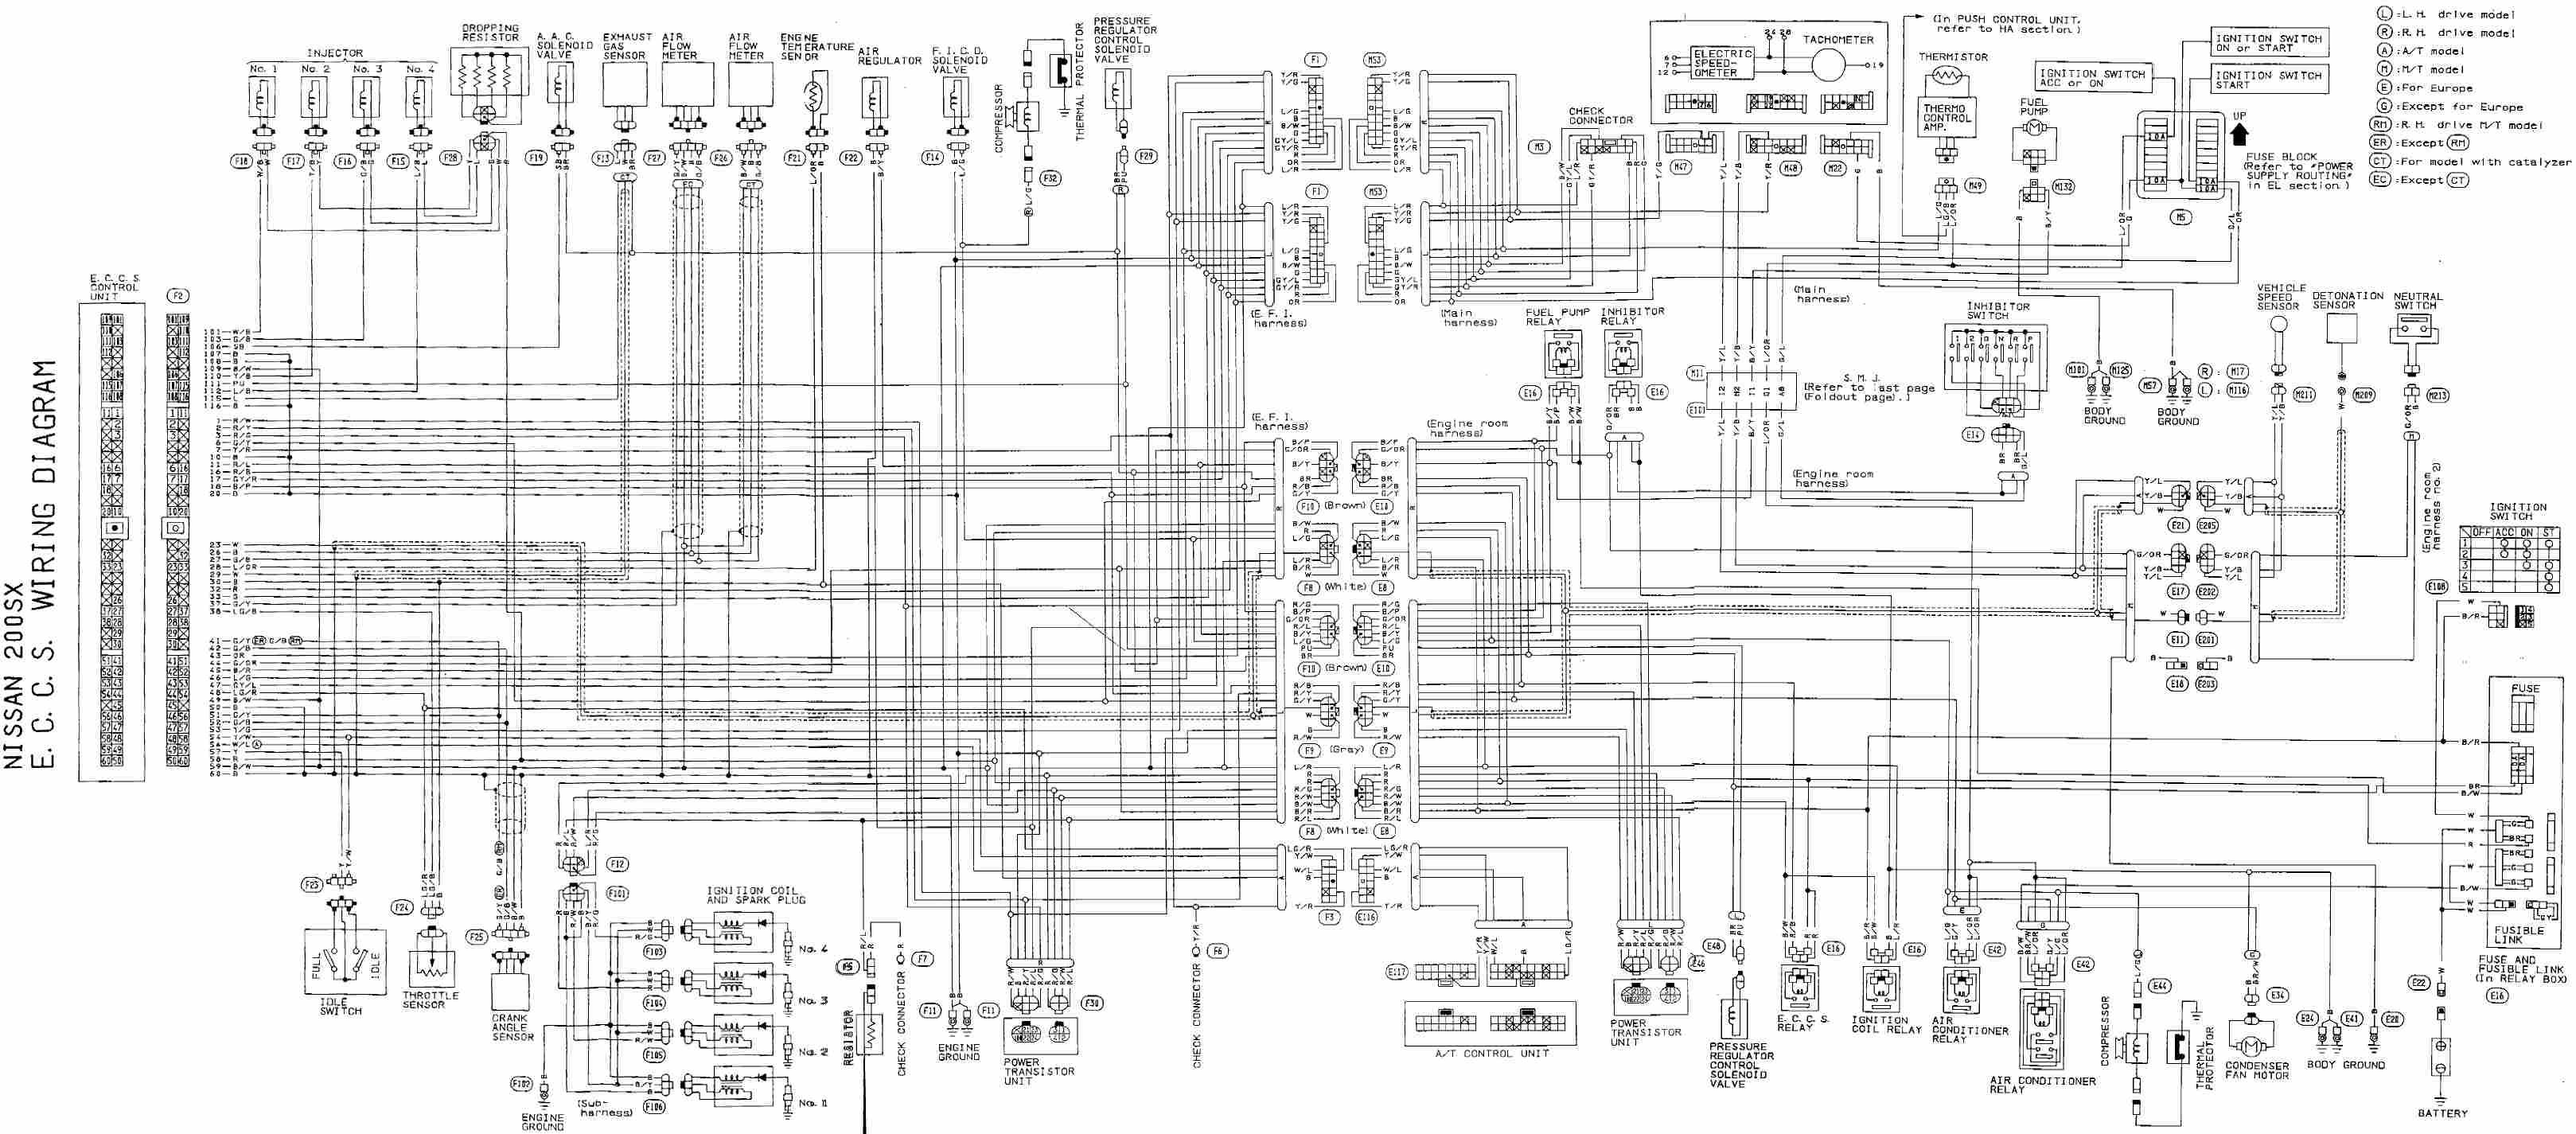 medium resolution of 2014 nissan nv stereo wiring diagram wiring librarynissan wiring diagram wiring diagrams box nissan lighting wiring